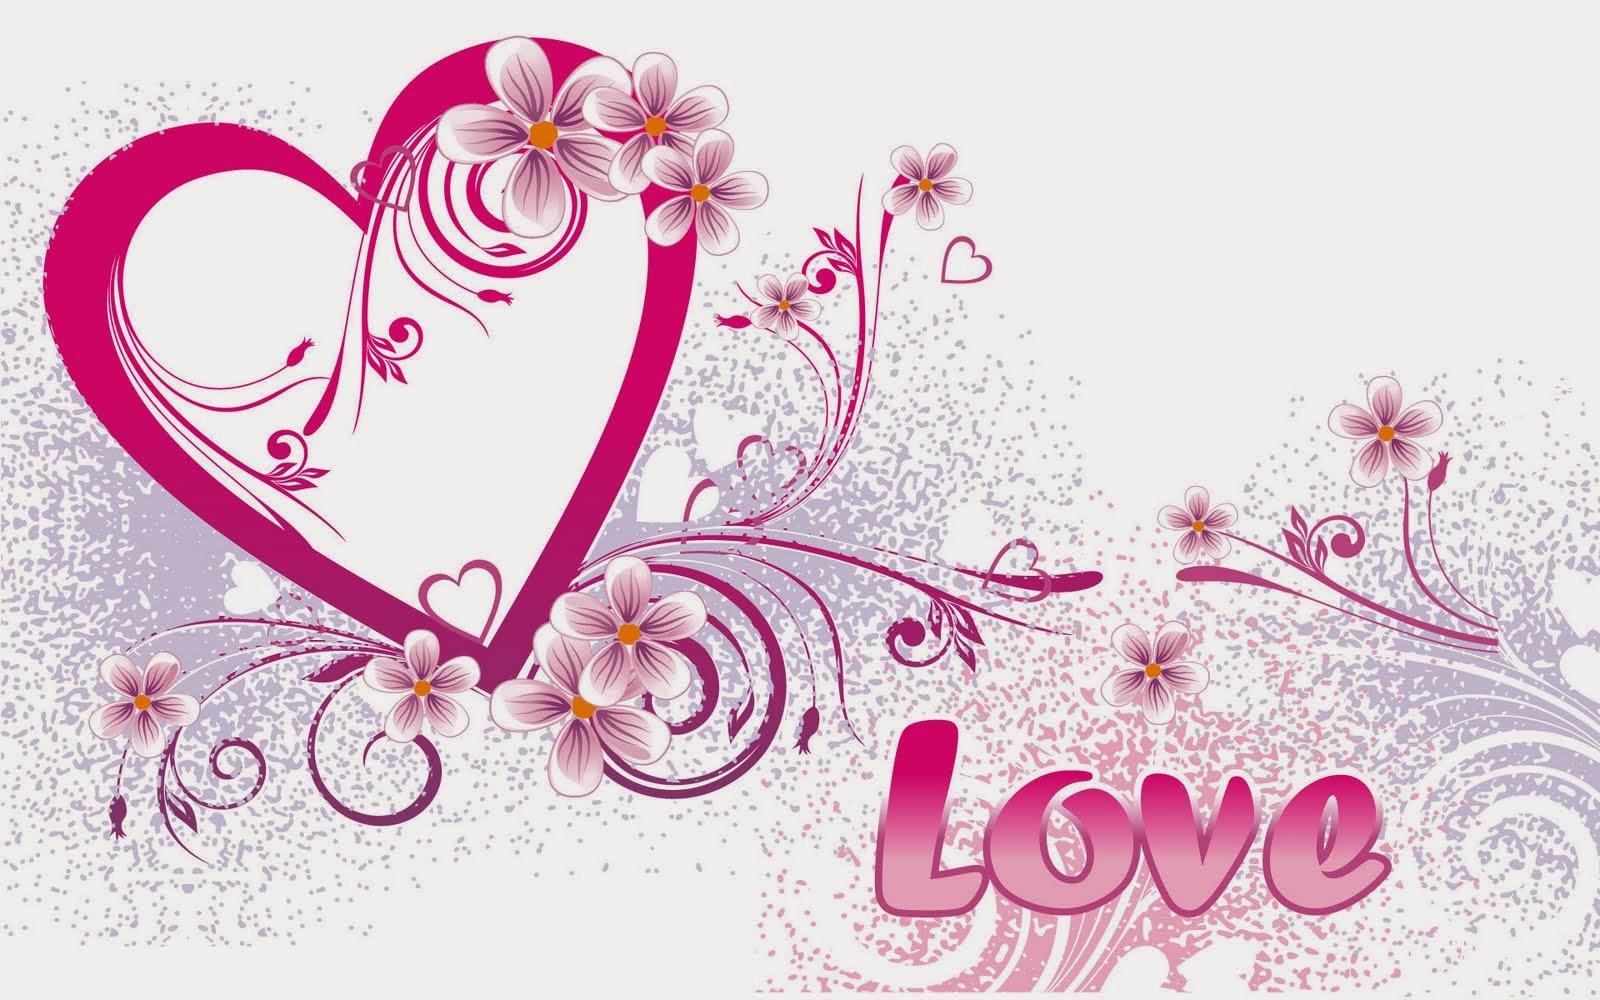 Love Wallpaper Live : Free live wallpaper love - beautiful desktop wallpapers 2014